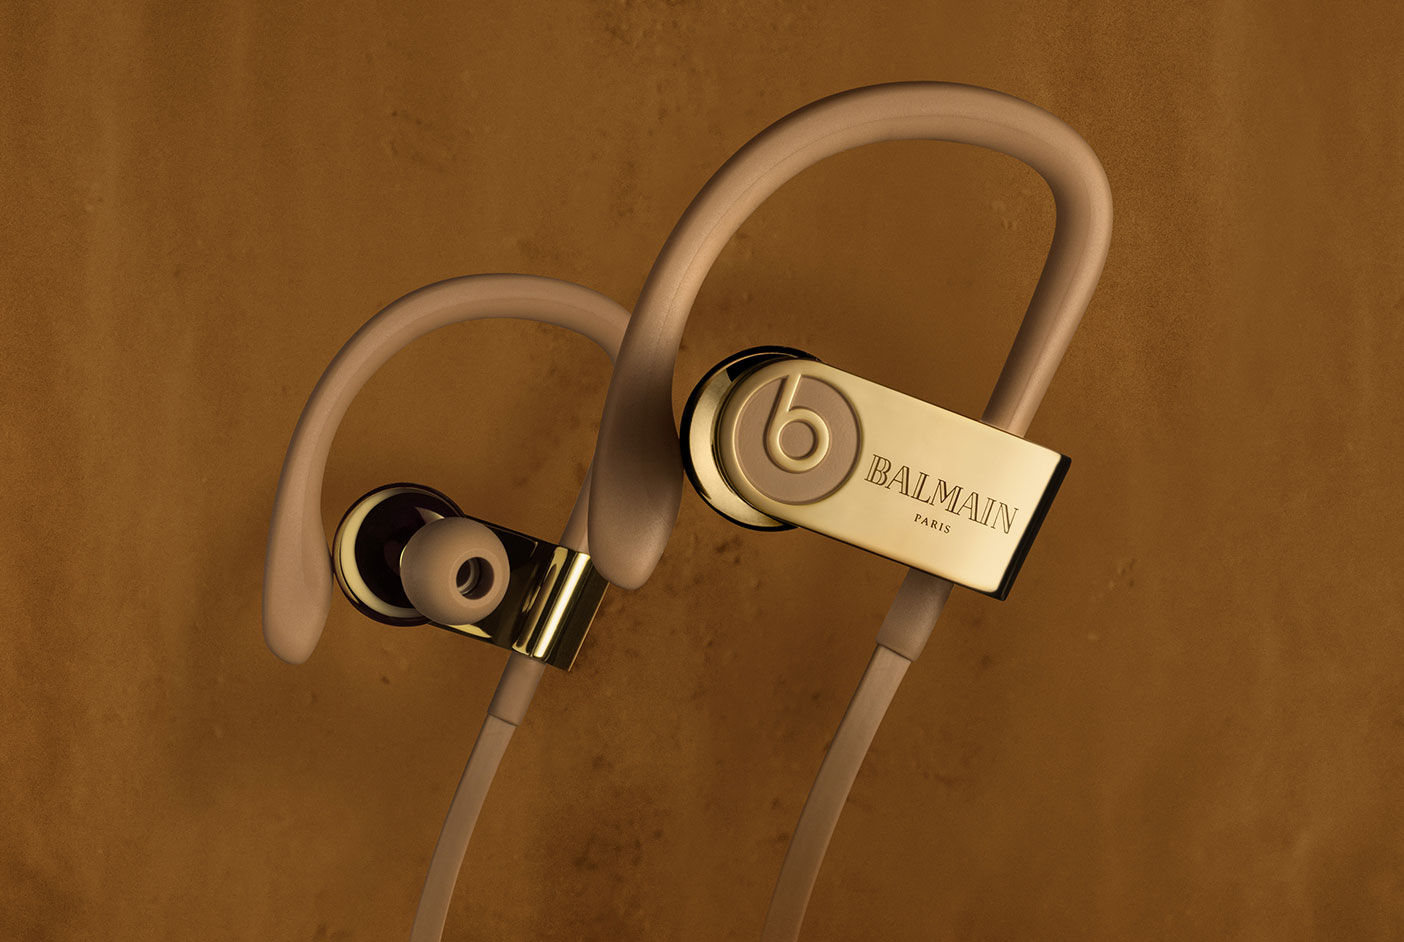 5b099064a8e Beats Collaborations - Special Edition Headphones & Speakers - Beats ...